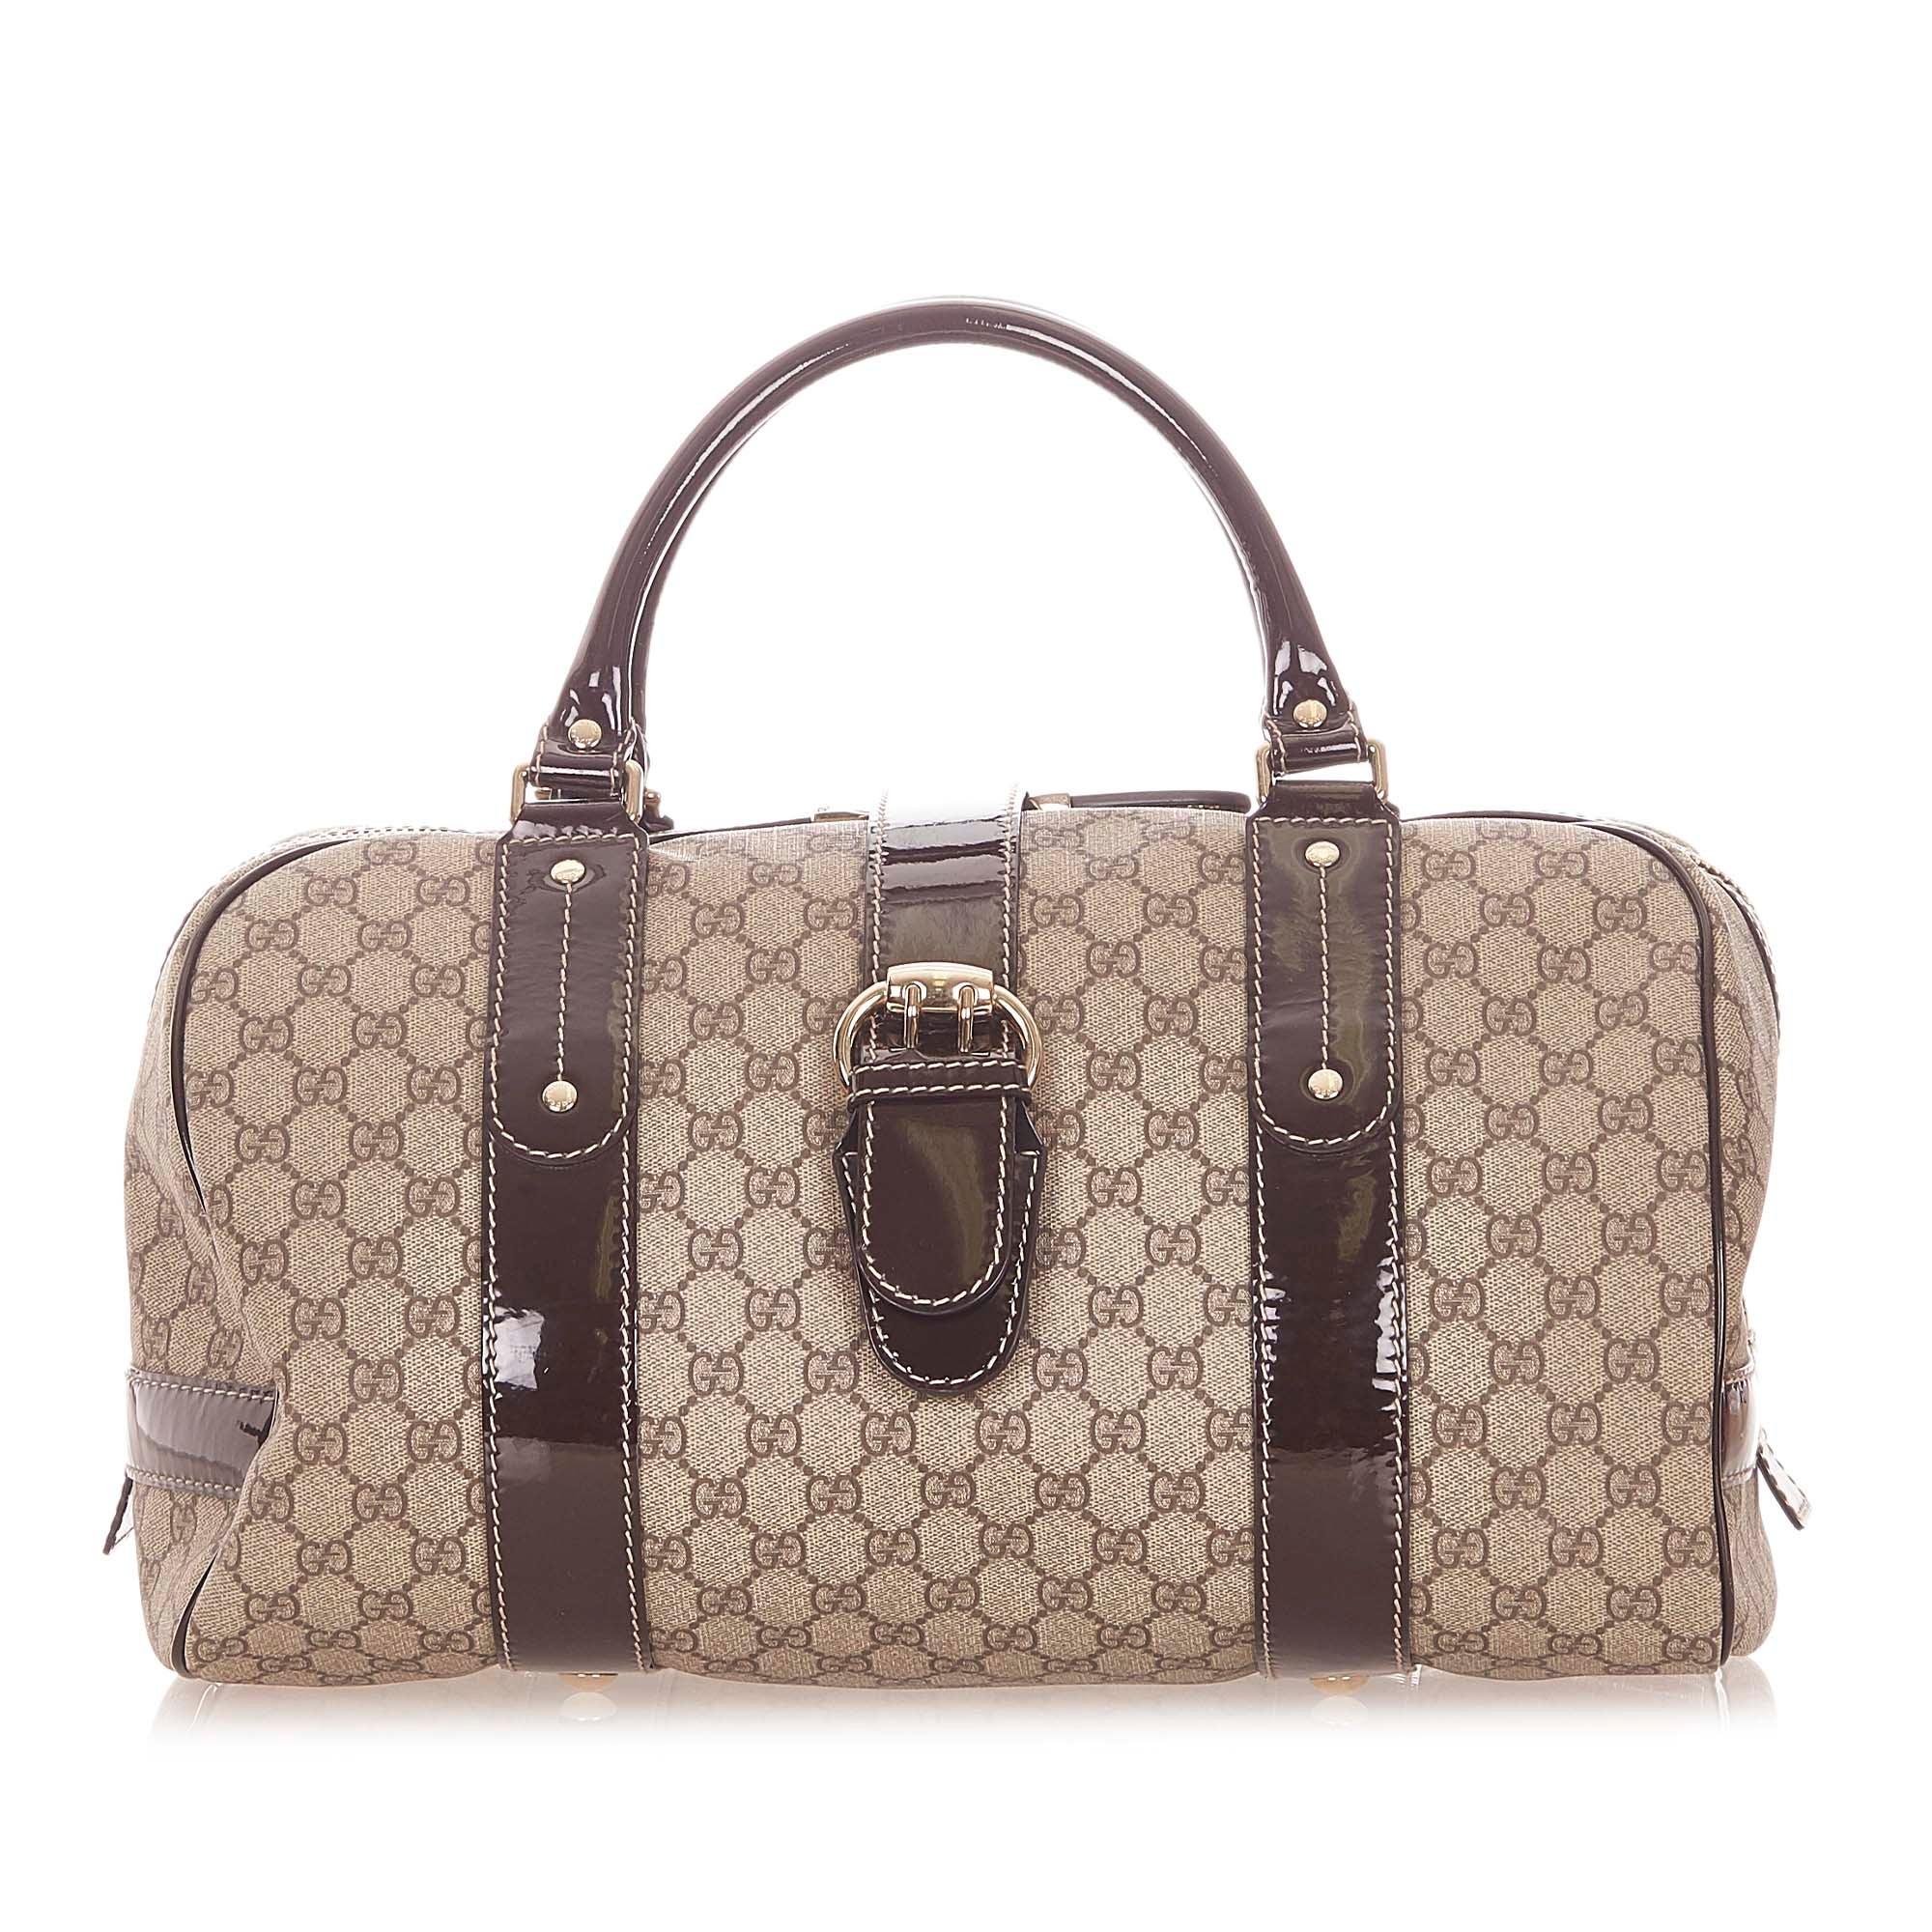 Gucci GG Supreme Boston Bag